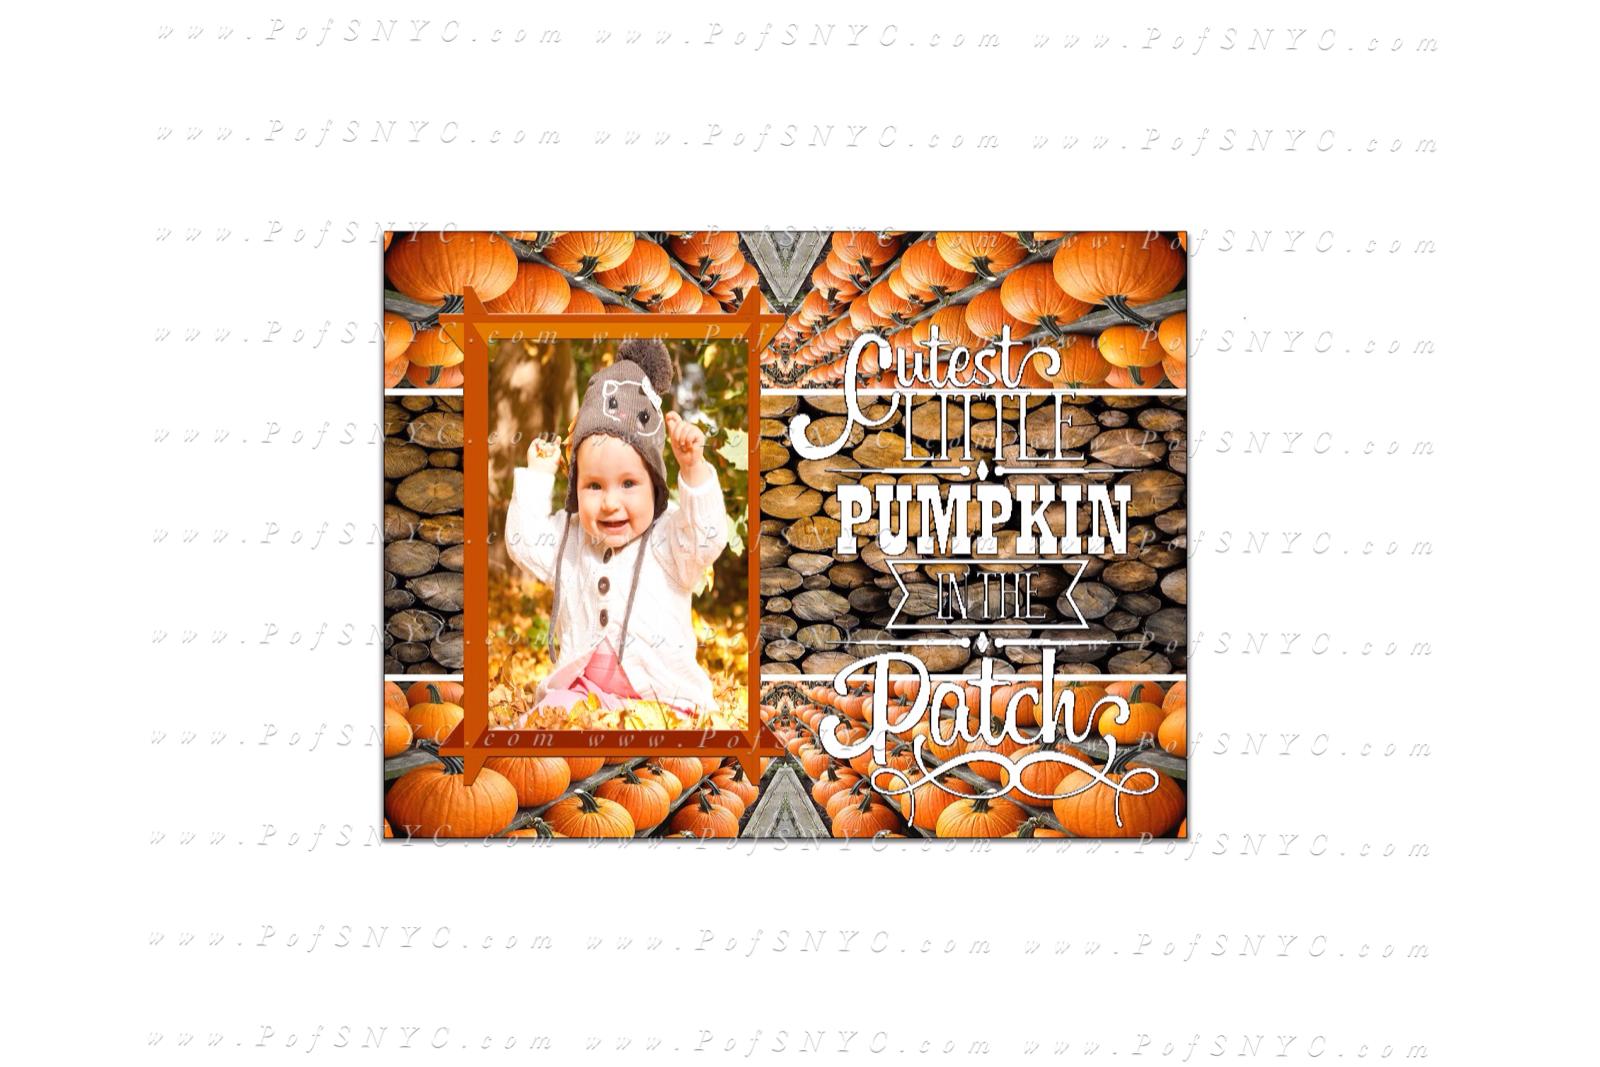 Pumpkin Patched